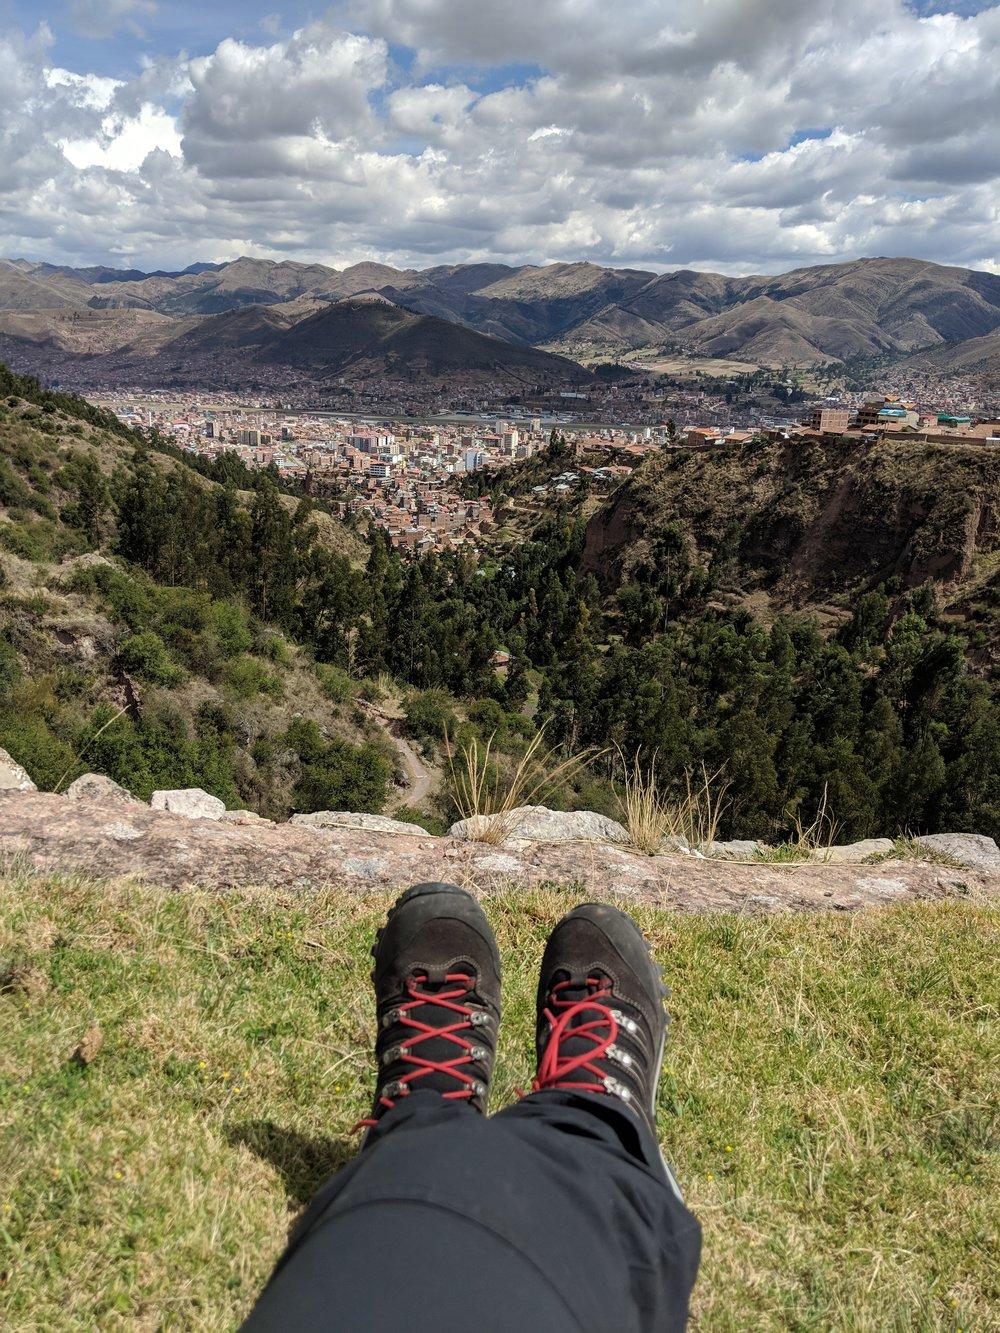 Enjoying the view of Cusco atop a surrounding hill.